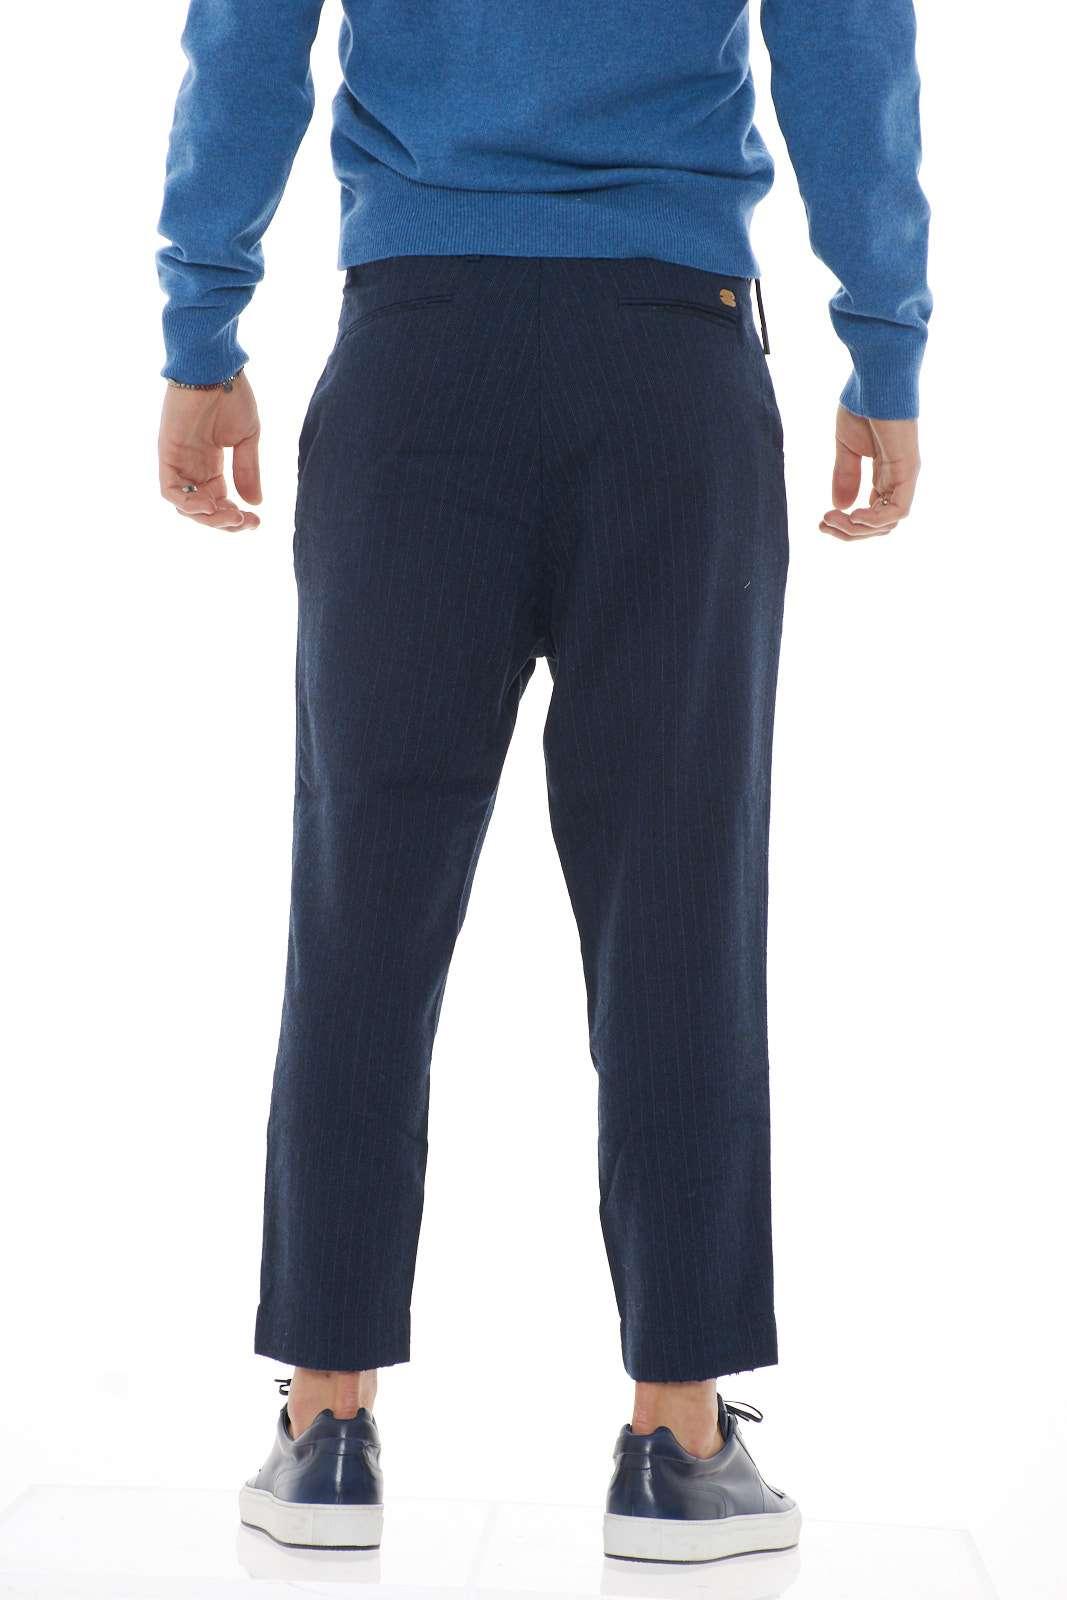 https://www.parmax.com/media/catalog/product/A/I/AI-outlet_parmax-pantaloni-uomo-Squad-qlc9744-C.jpg